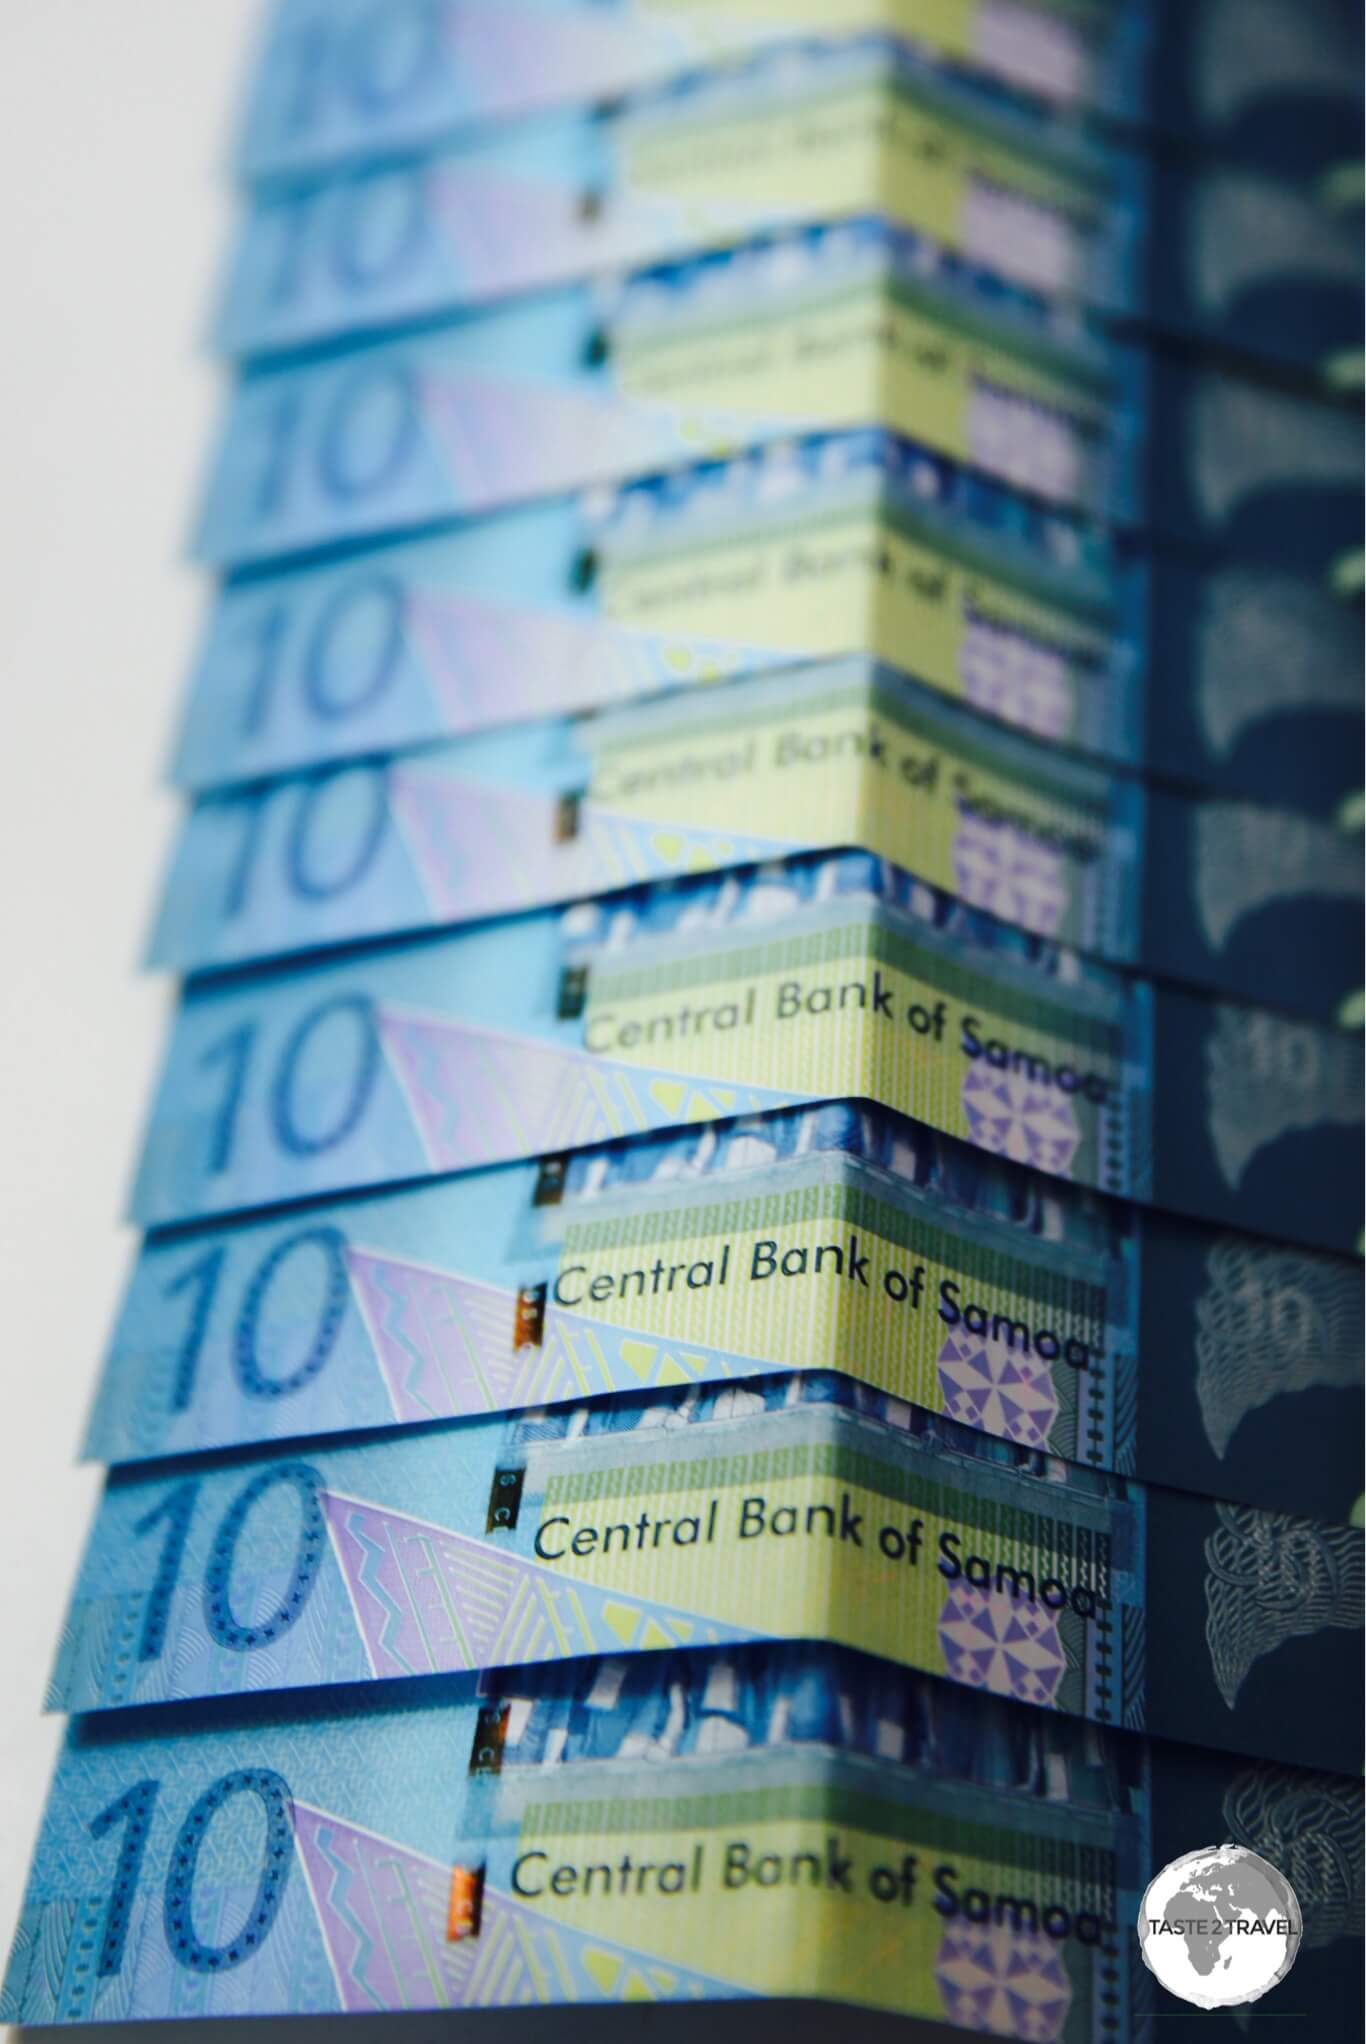 Currency: Samoan Tala